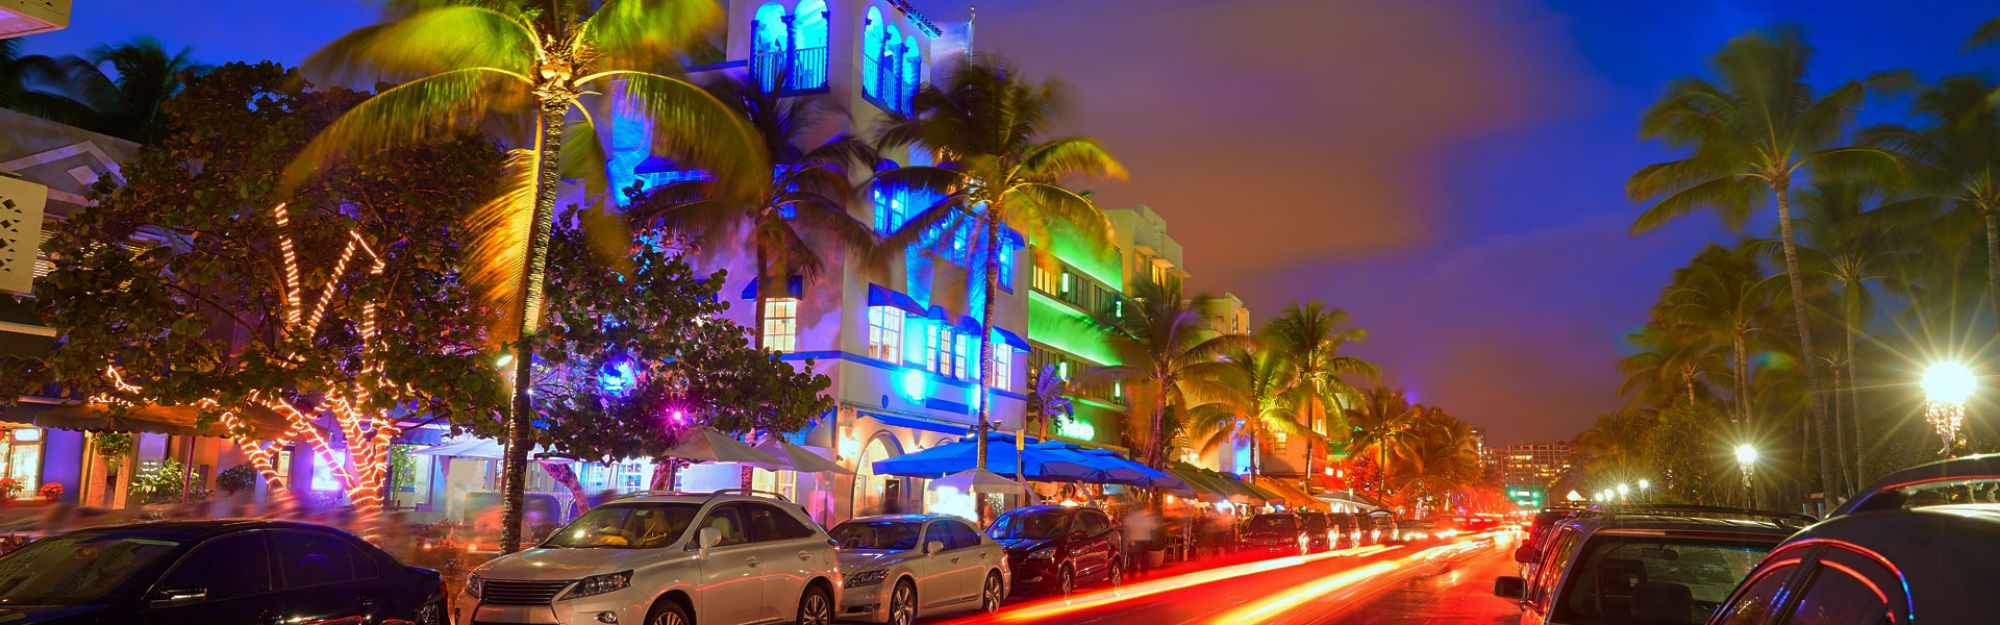 Miami for the Broke College Student: Part 1.